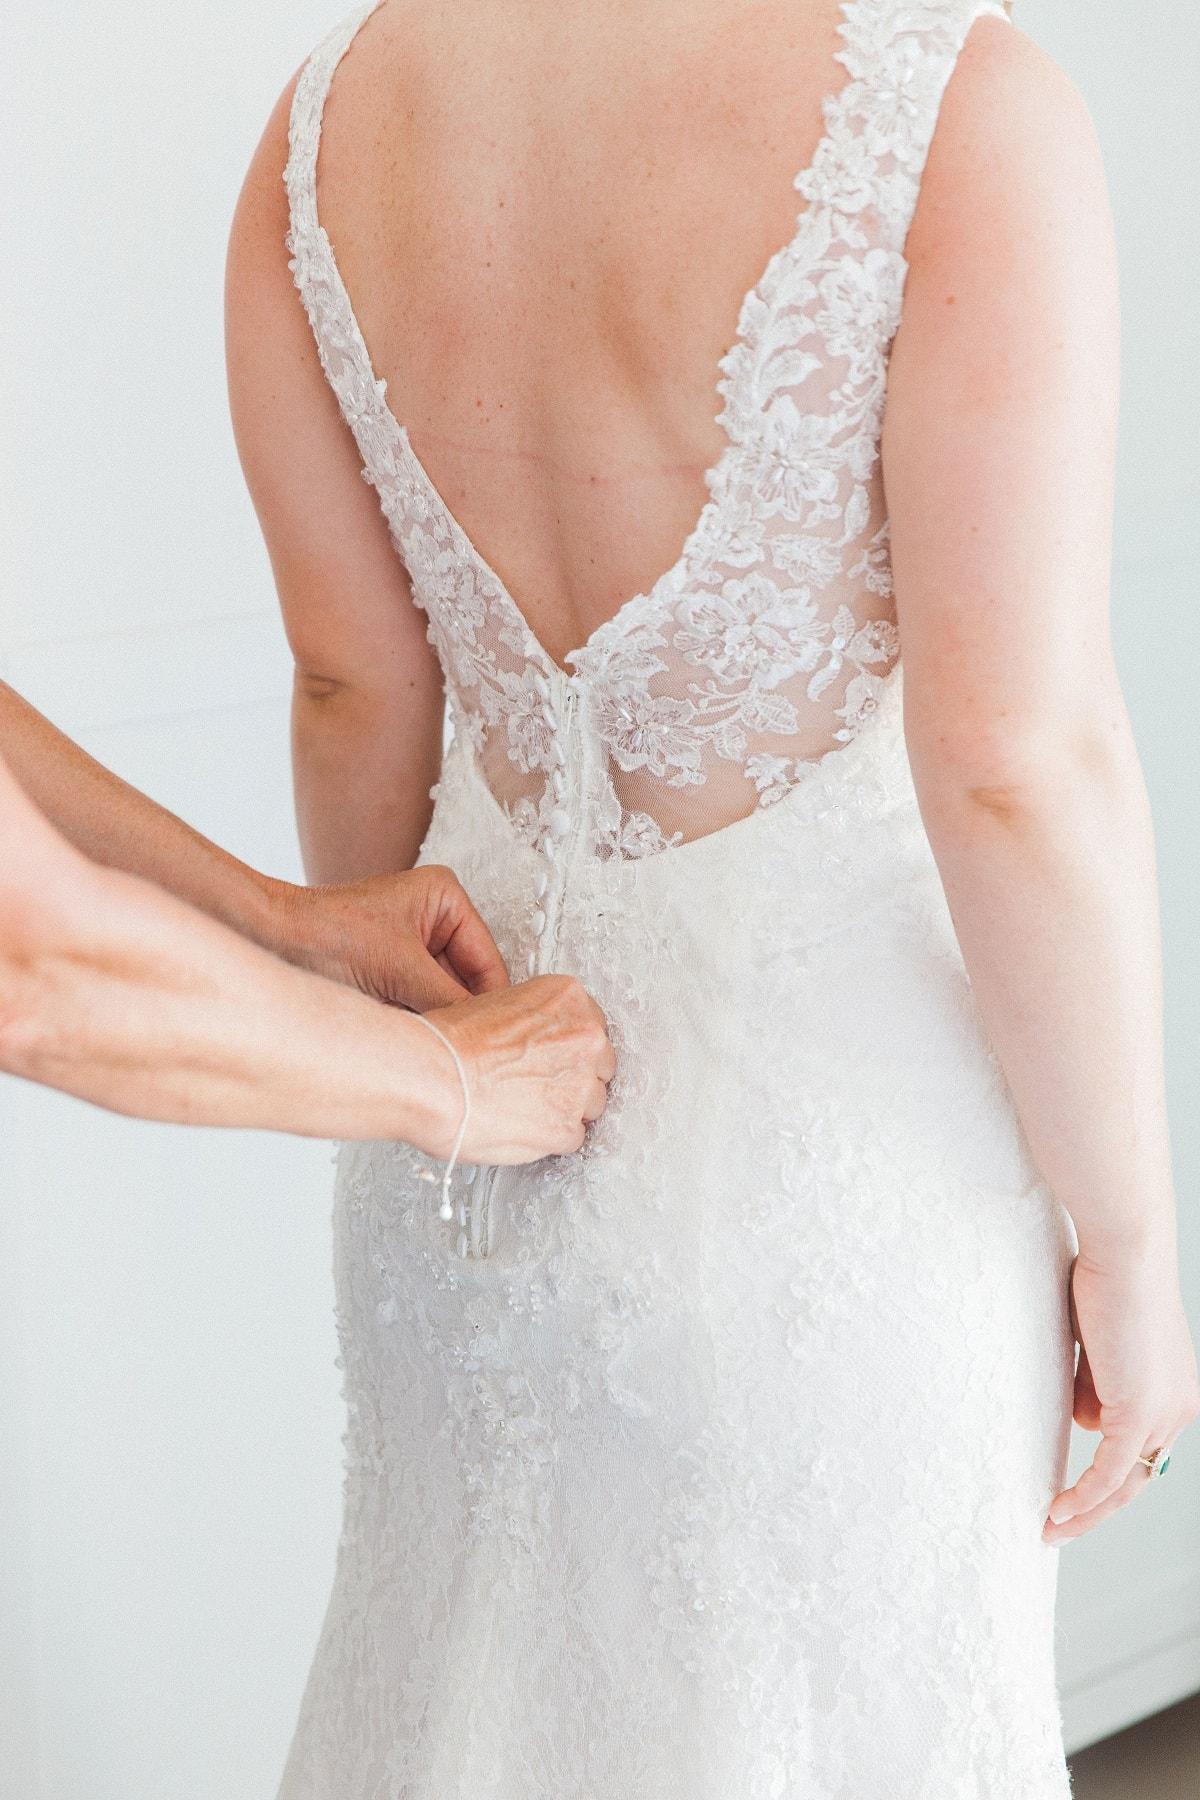 Bride Getting Ready - Greek Wedding Abroad   Planned by Lefkas Weddings   Maxeen Kim Photography